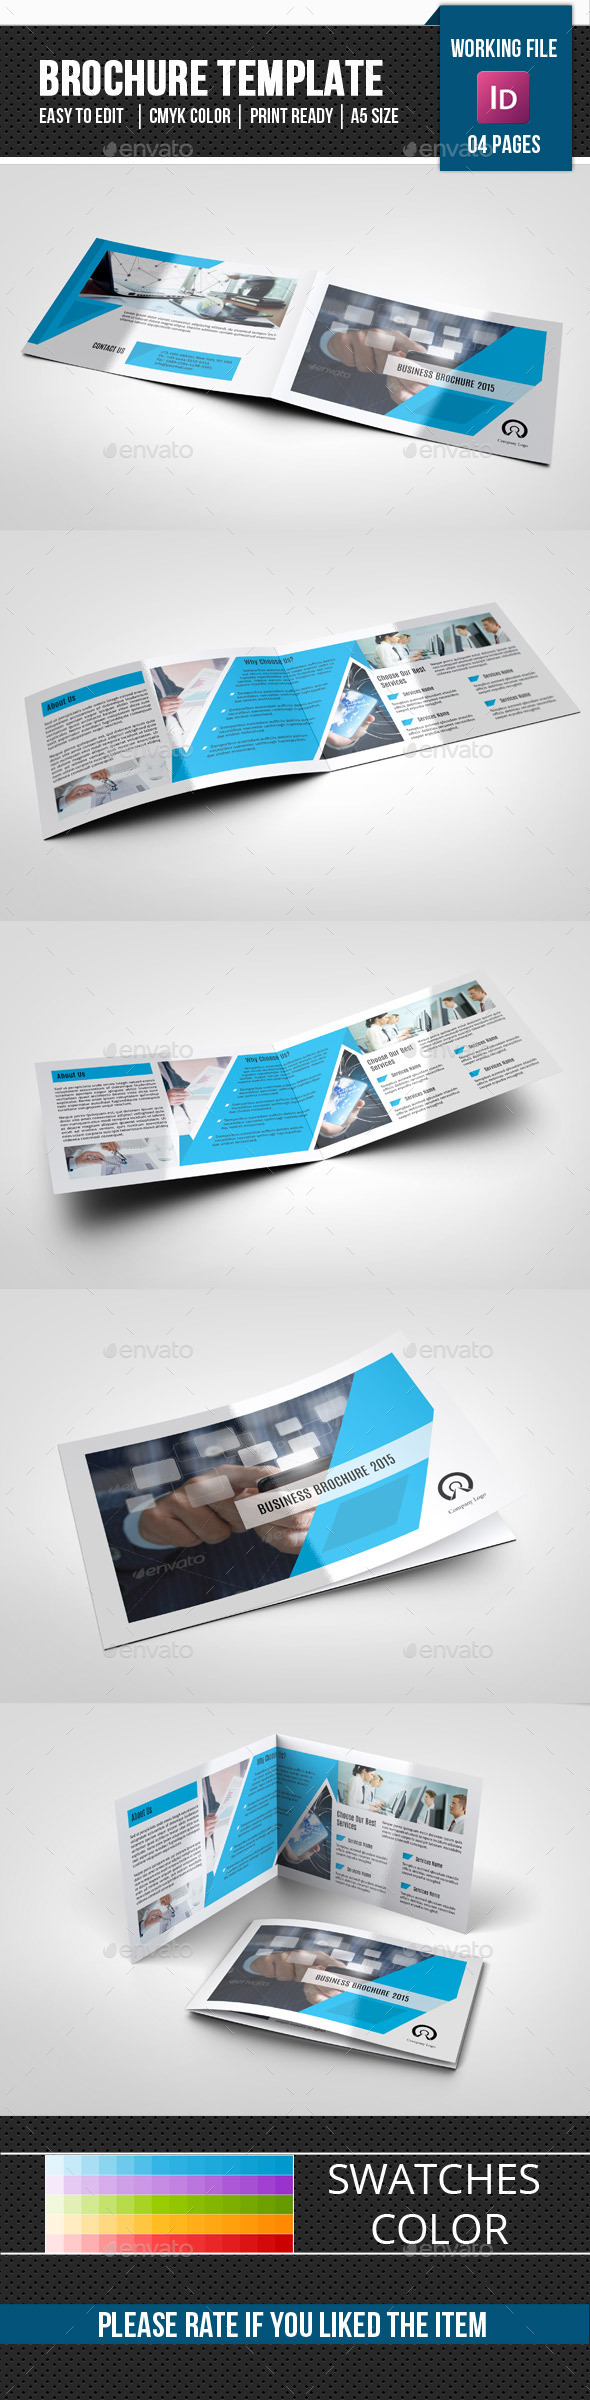 Corporate Landscape Brochure-V298 - Corporate Brochures